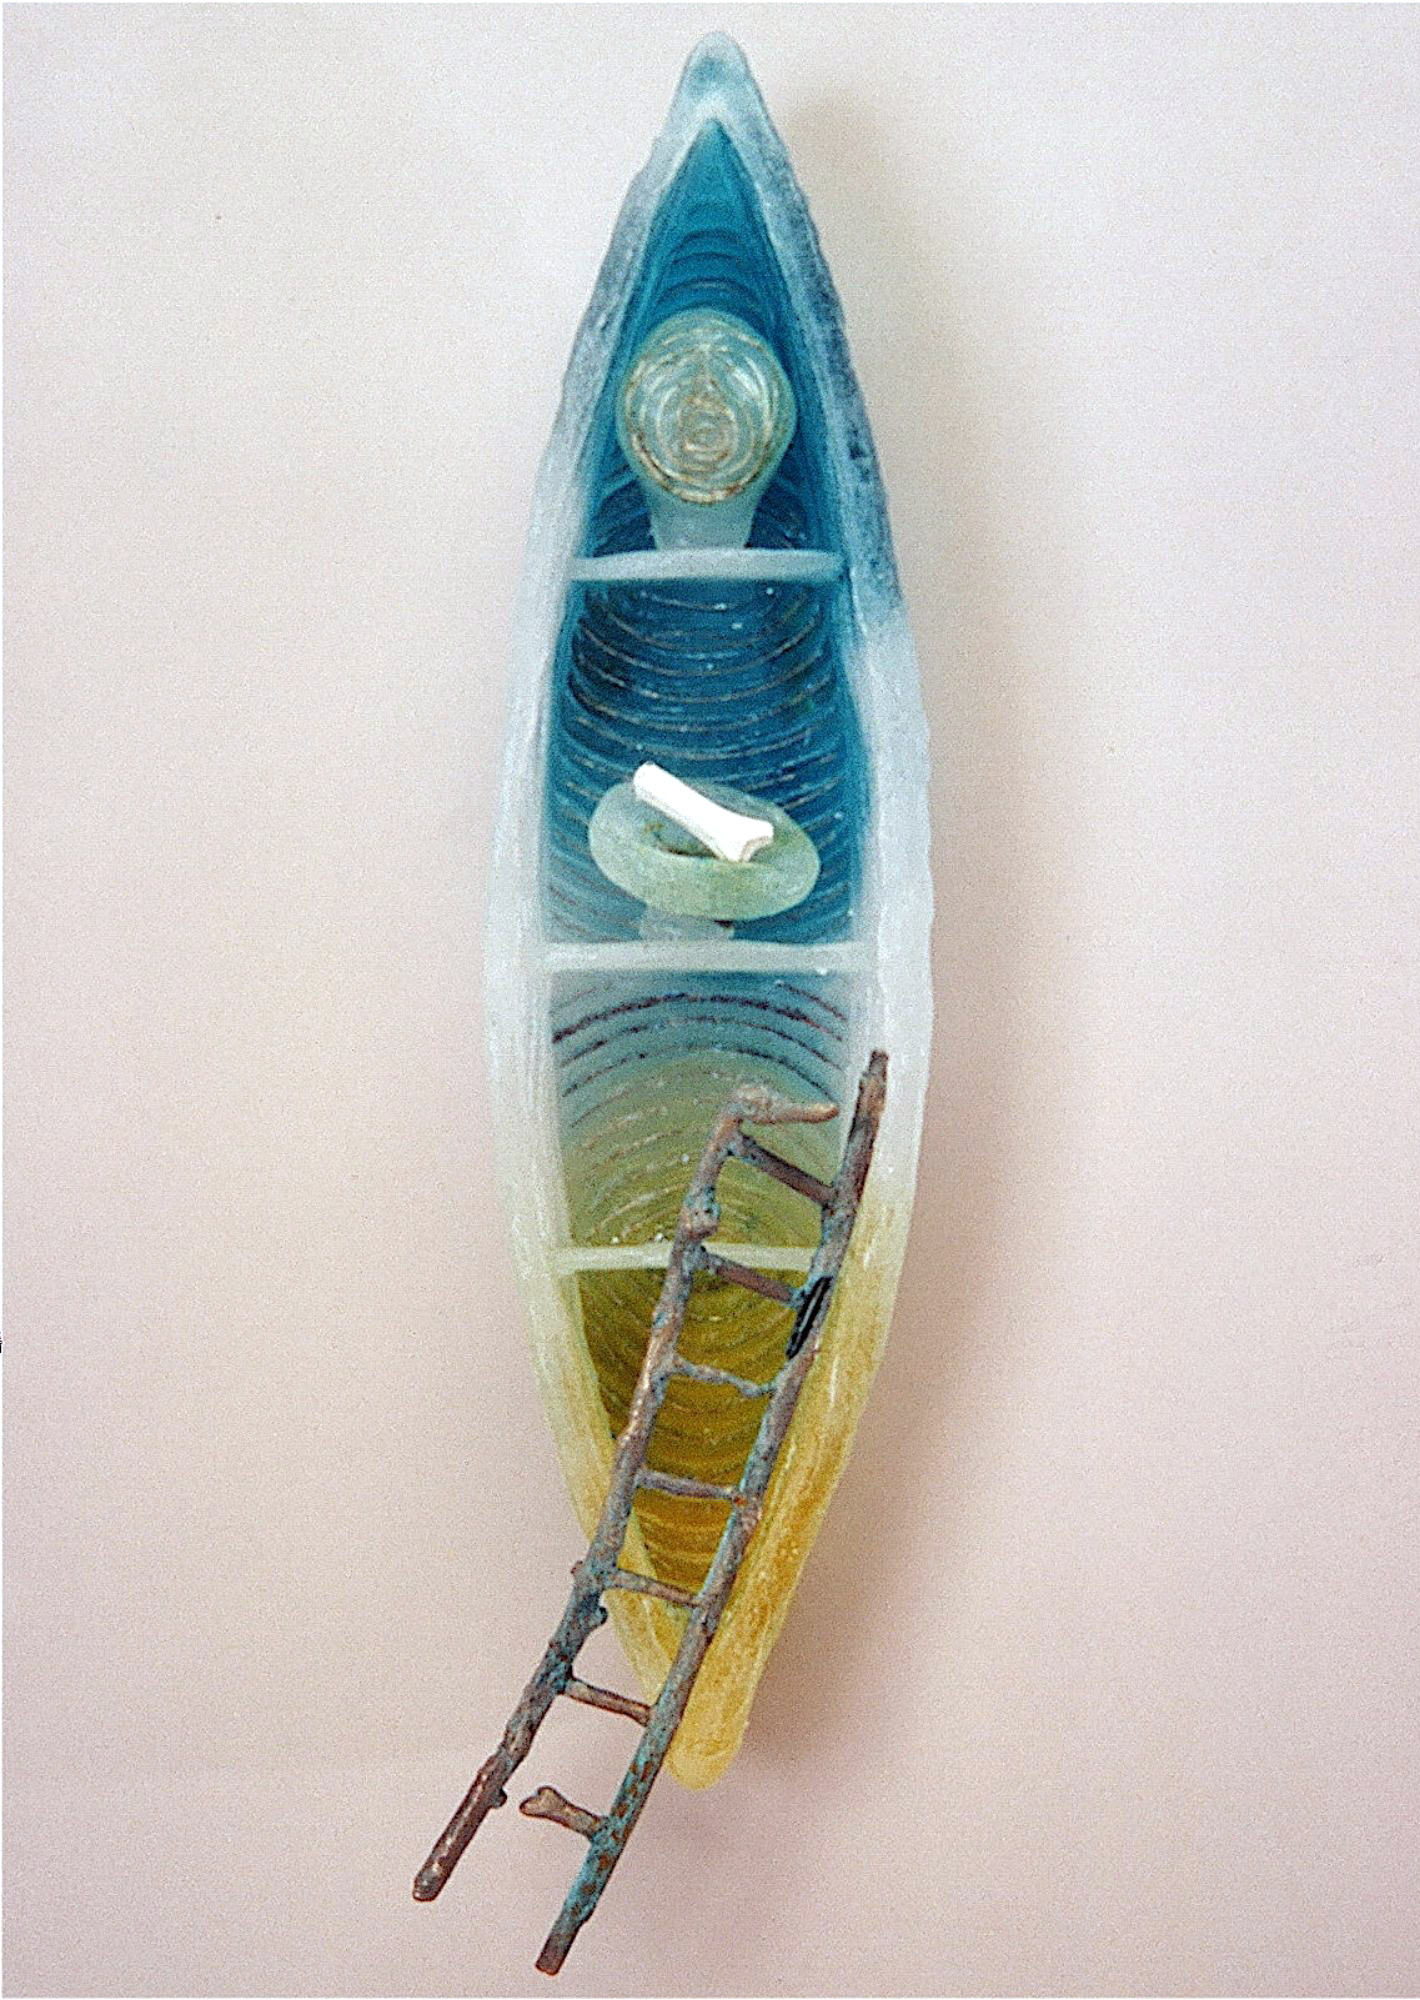 judeglass soul vessel ladder cast glass art